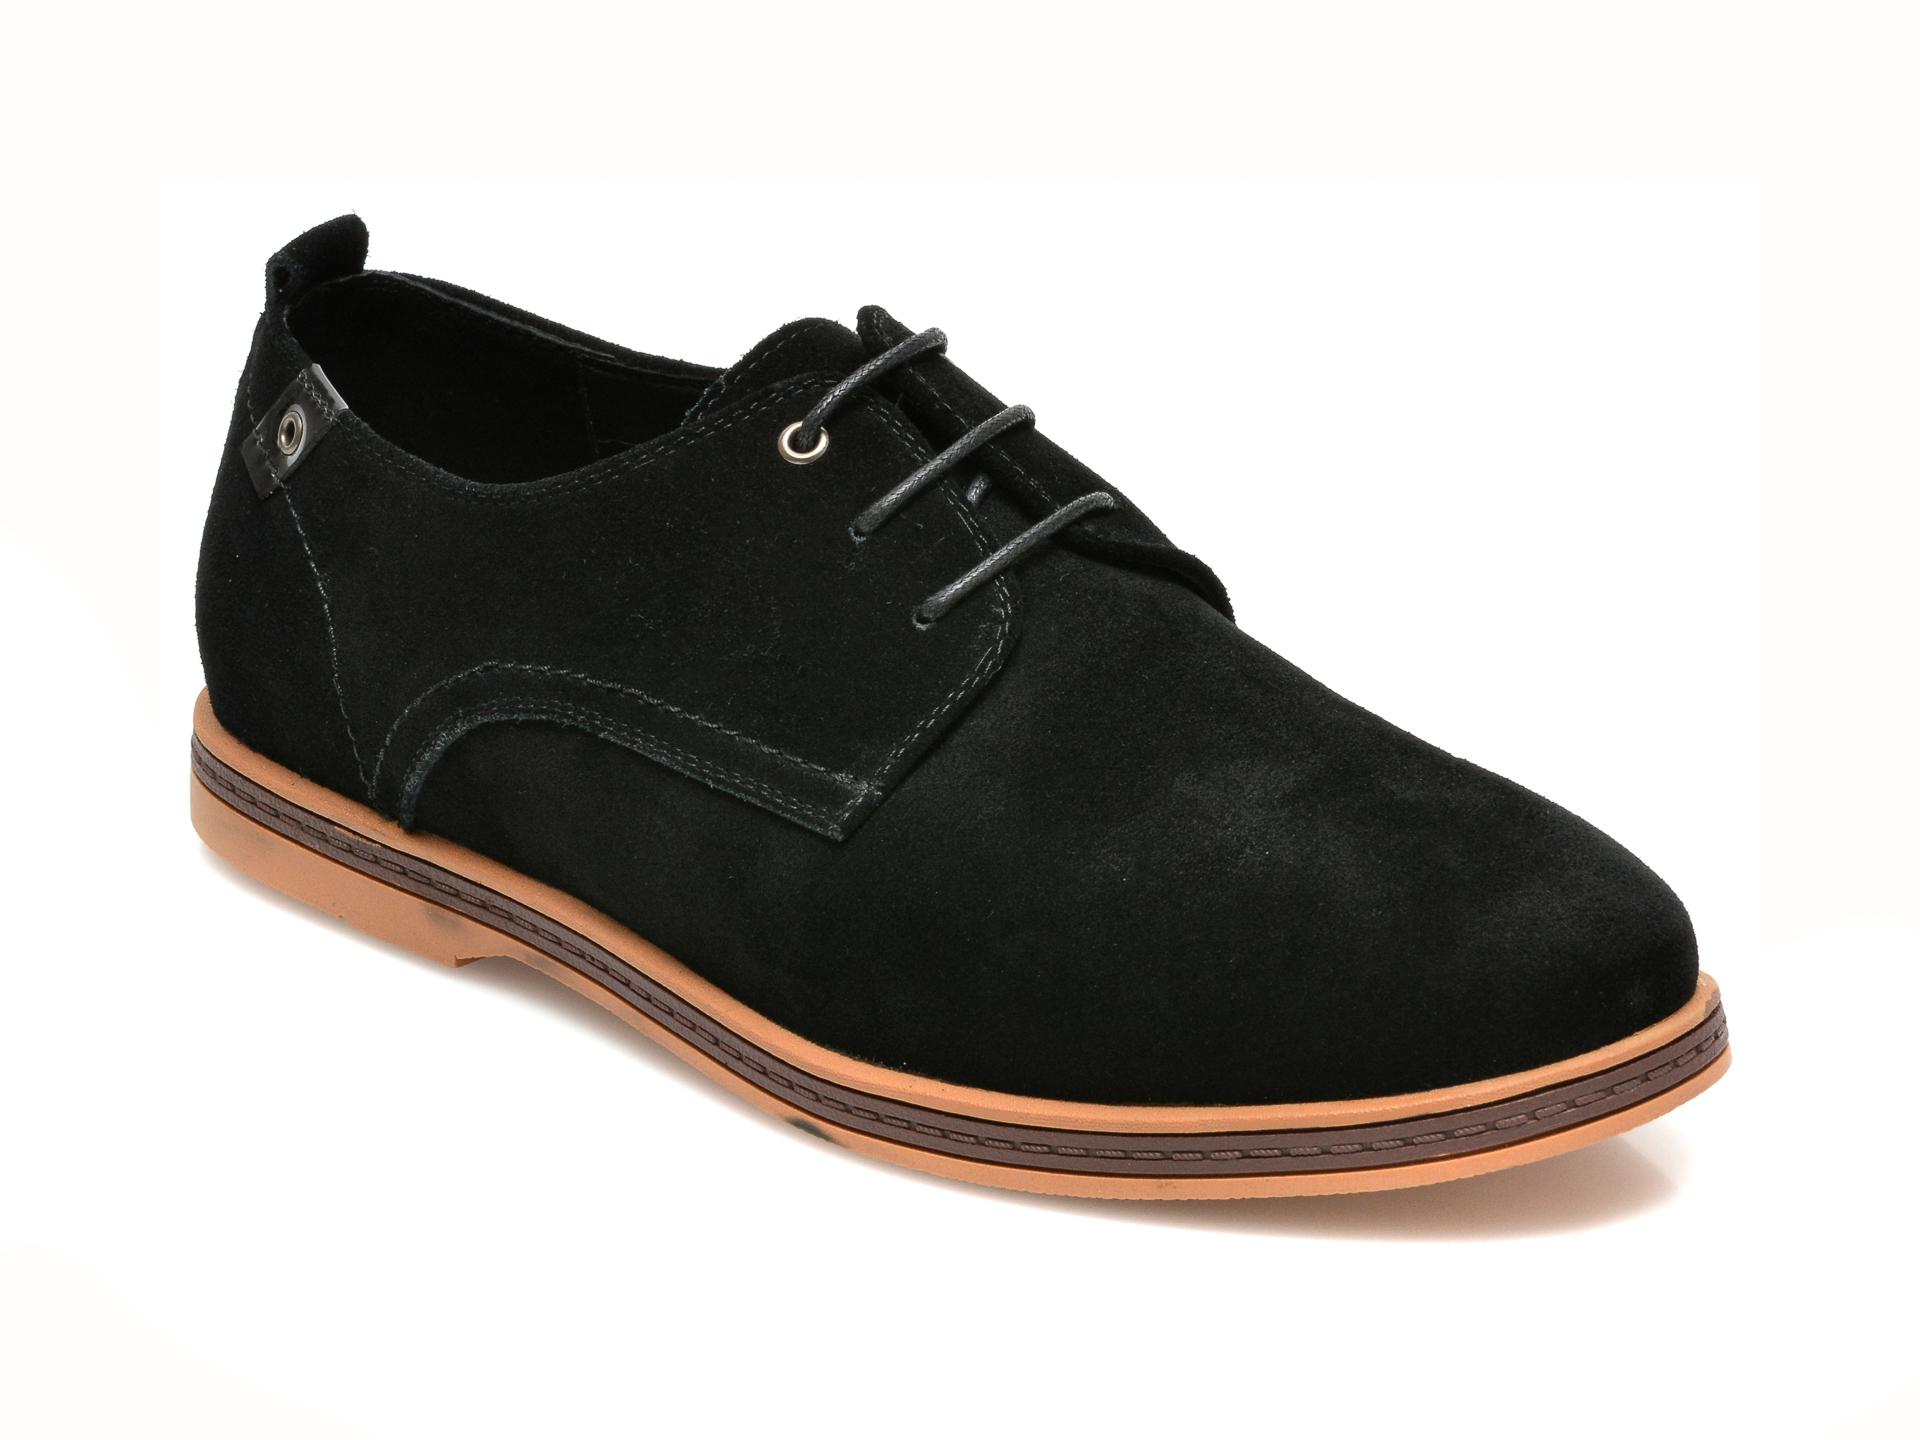 Pantofi OTTER negri, F01881, din piele intoarsa